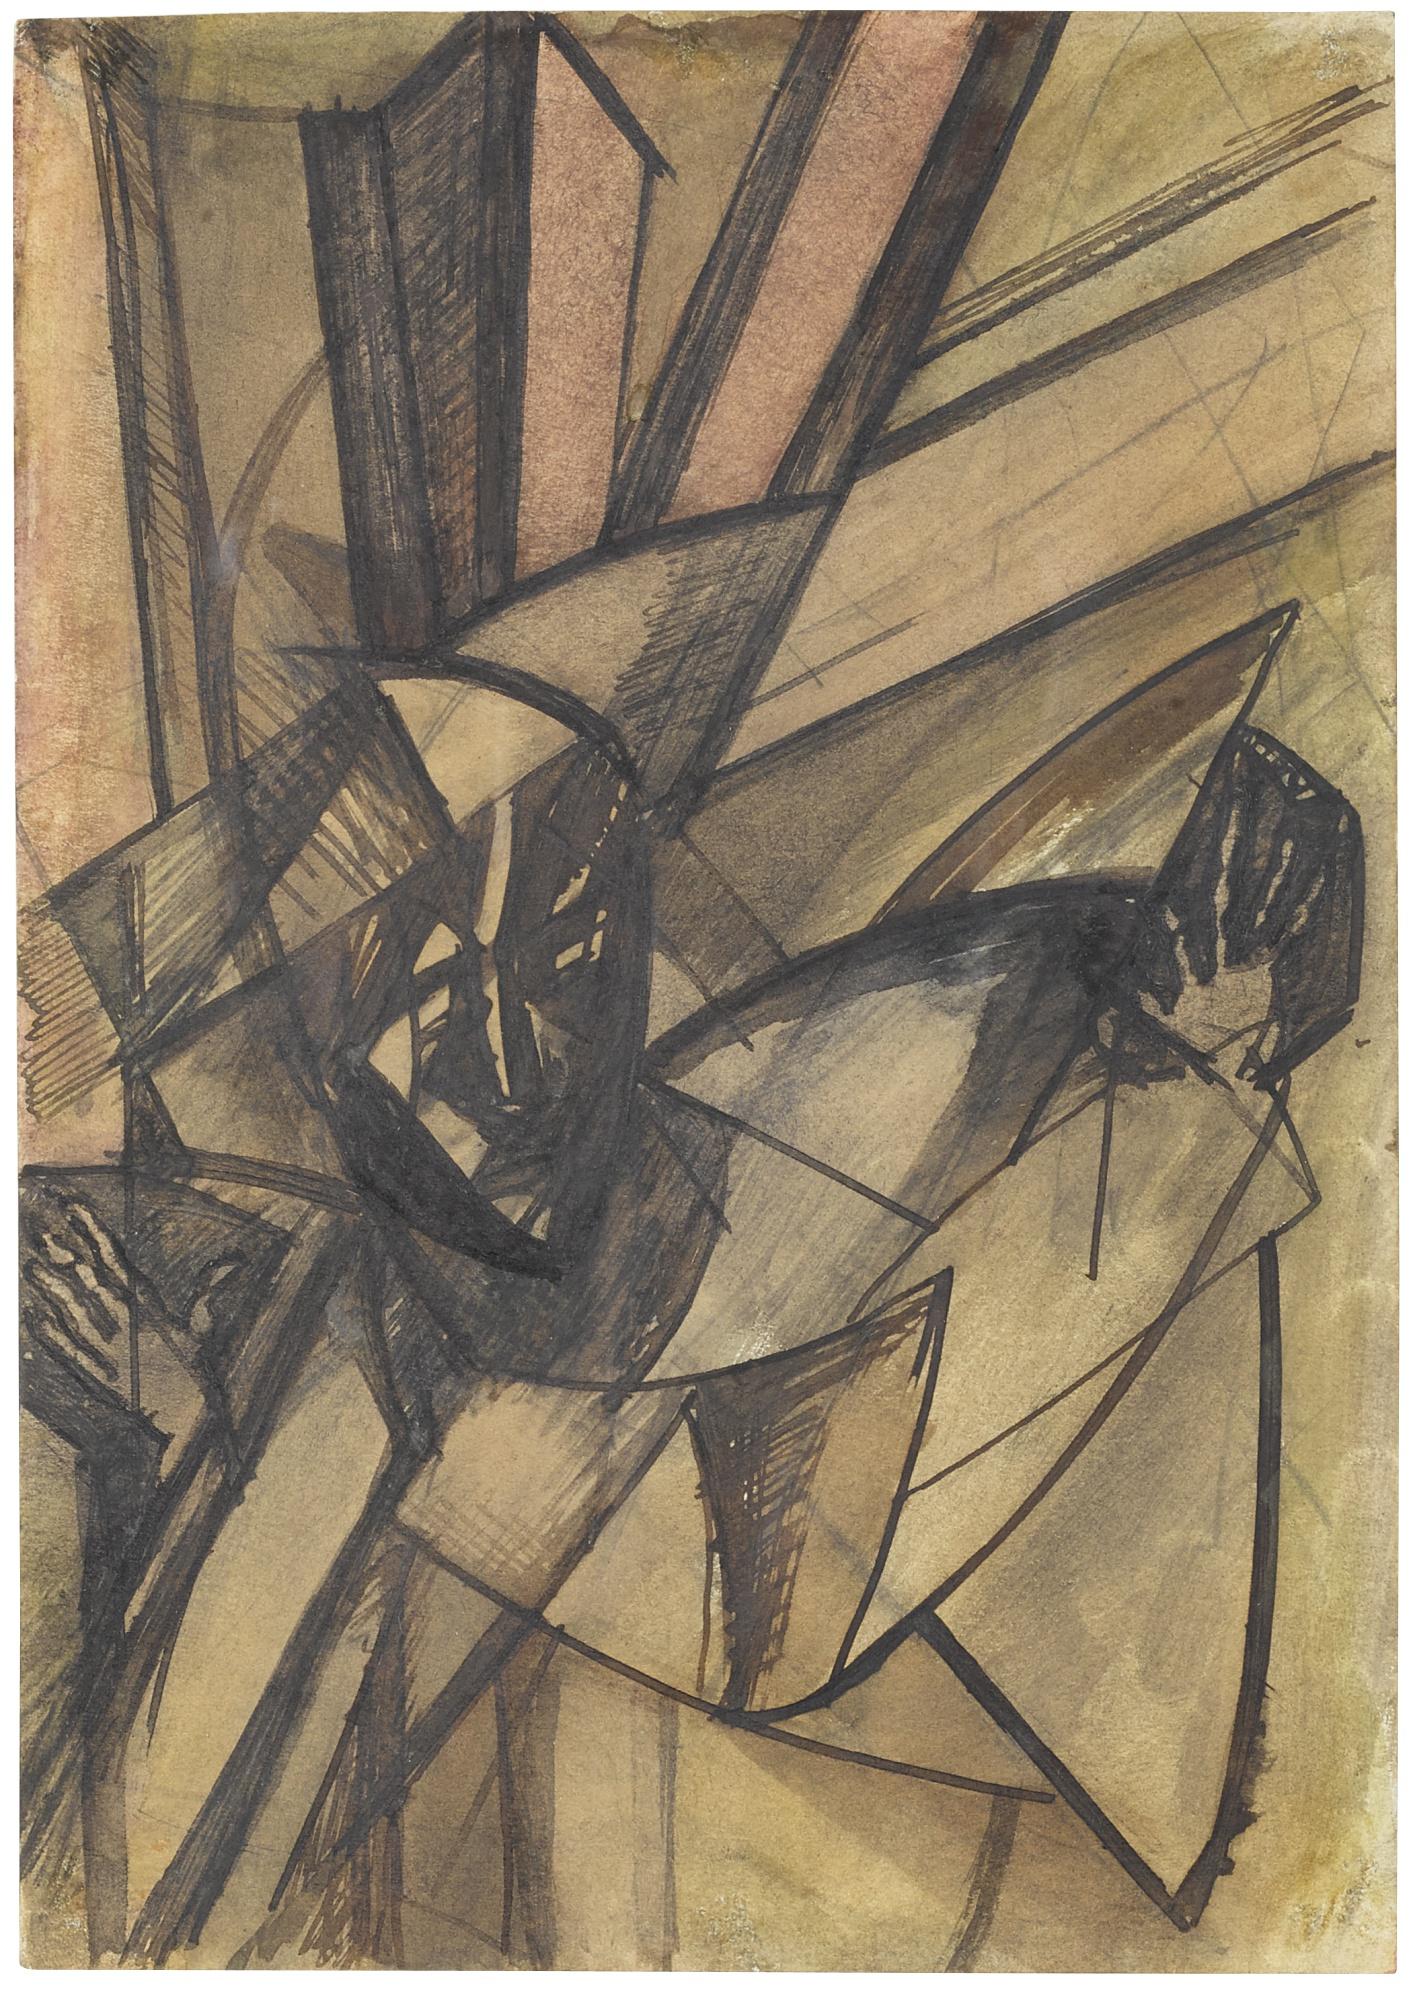 Wyndham Lewis-Futuristic Figure-1912